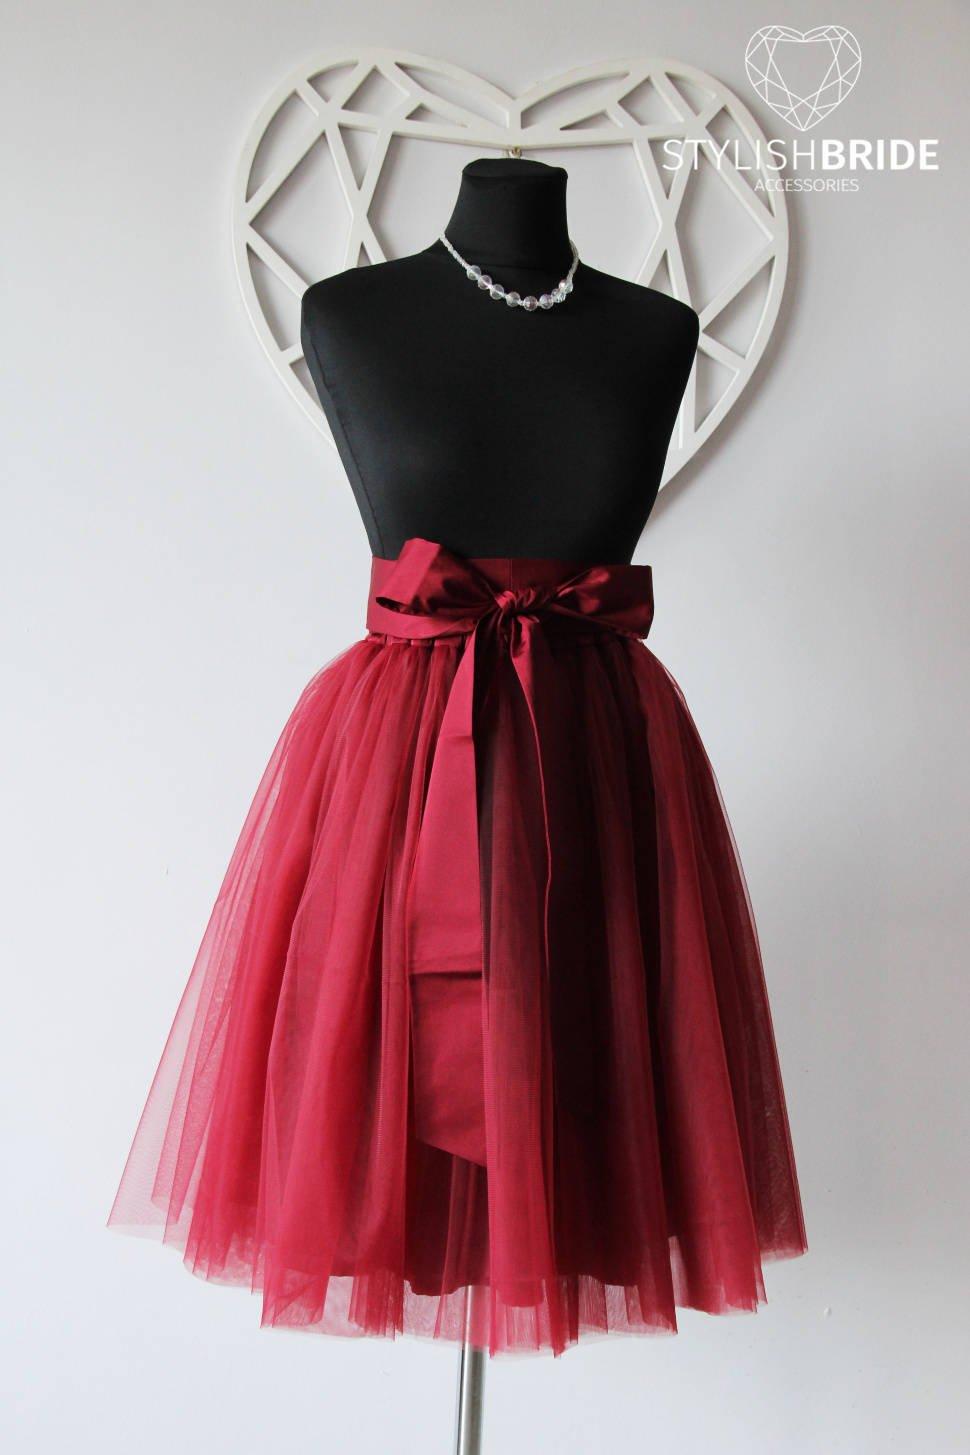 f461ded541 Amazon.com: Wine Tulle Skirt Silk Sash Bow, Dark Red Tulle Skirt, Women Tulle  Skirt, Princess Skirt, Wedding Tulle Skirt, Bridesmaids skirt: Handmade